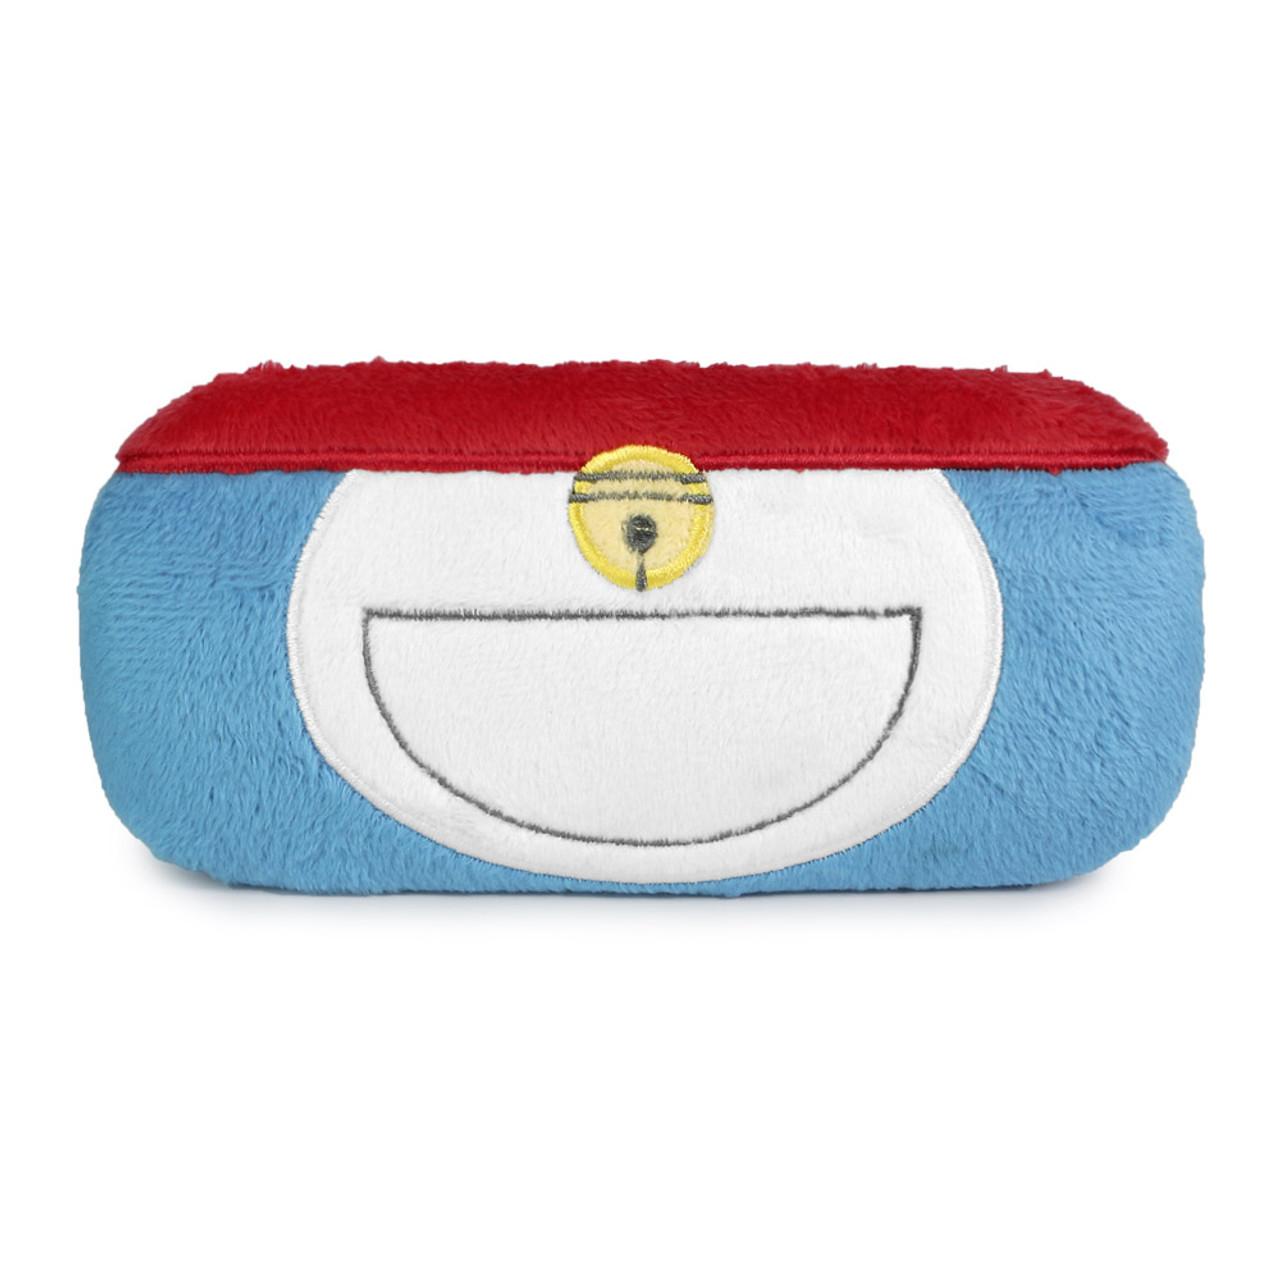 Doraemon Cute Body Plush Eyewear Case ( Front View )